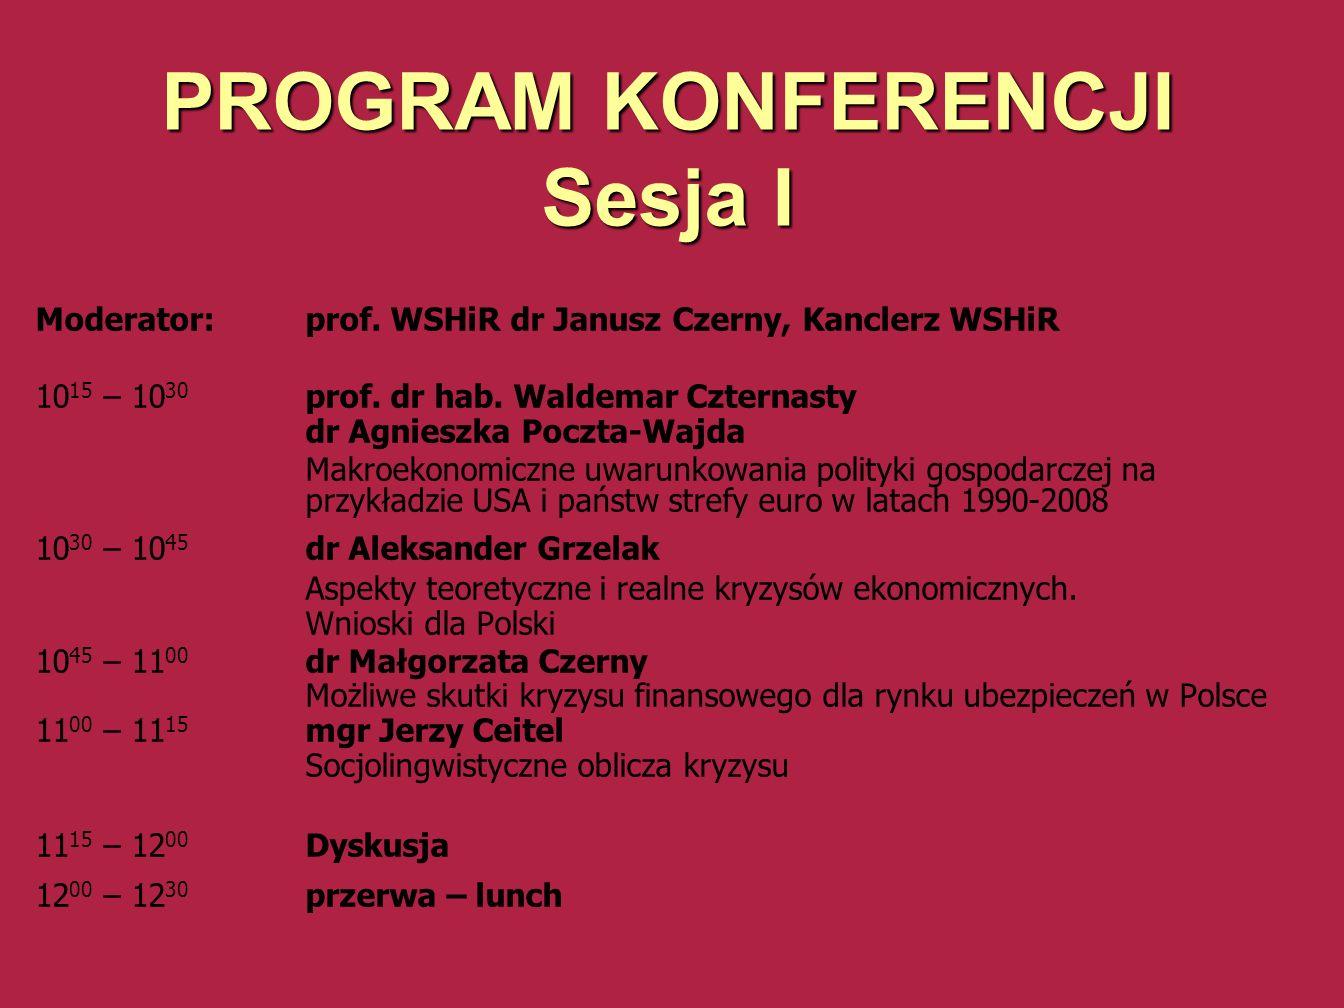 PROGRAM KONFERENCJI Sesja II Moderator: dr Maria Beyga-Cegiołka, Prorektor WSHiR 12 30 – 12 45 dr Maria Beyga-Cegiołka, prof.